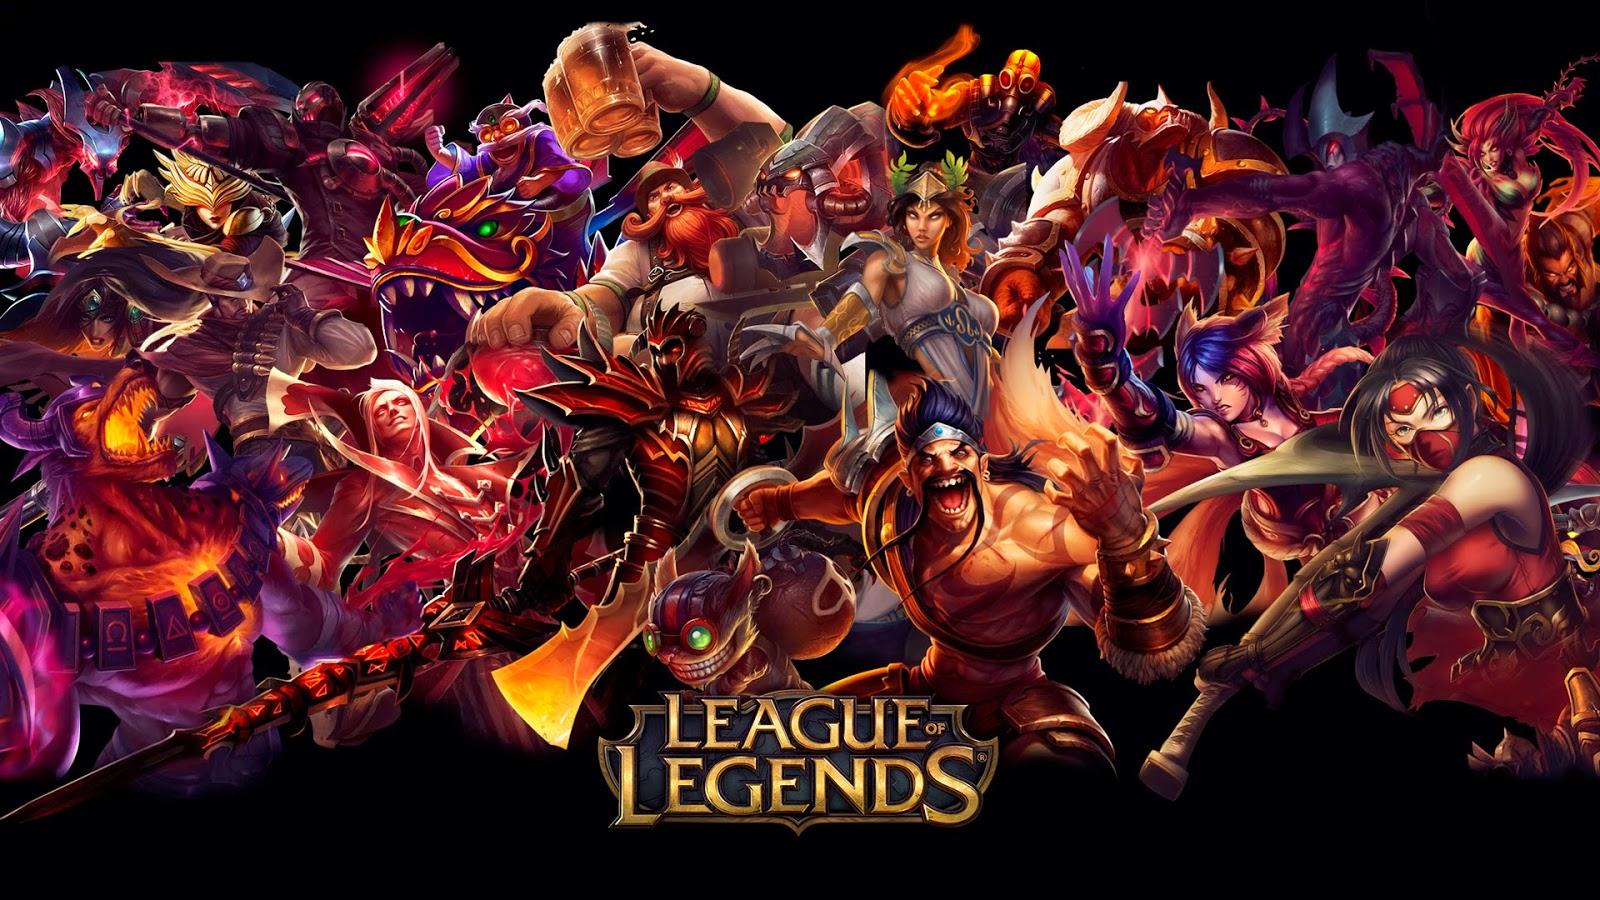 Vladimir league of legends wallpaper vladimir desktop - League desktop backgrounds ...